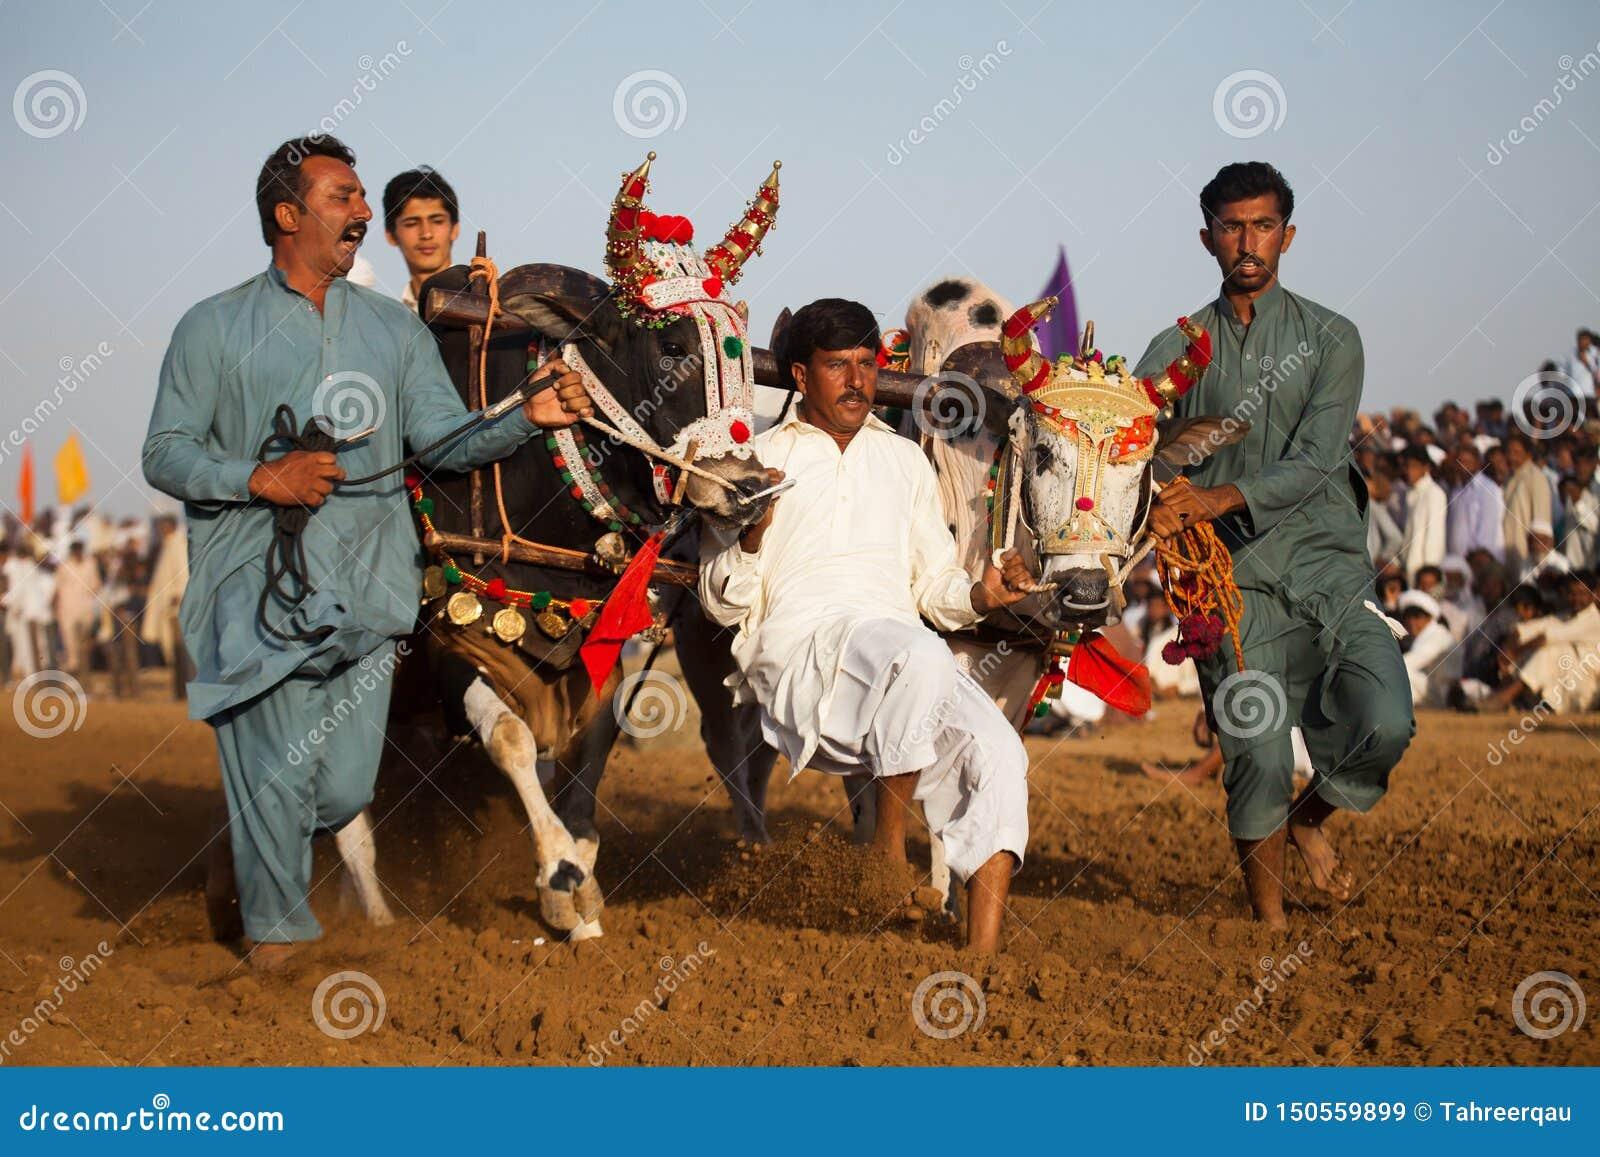 Men controlling bulls at a tarditional punjabi bull race competetion